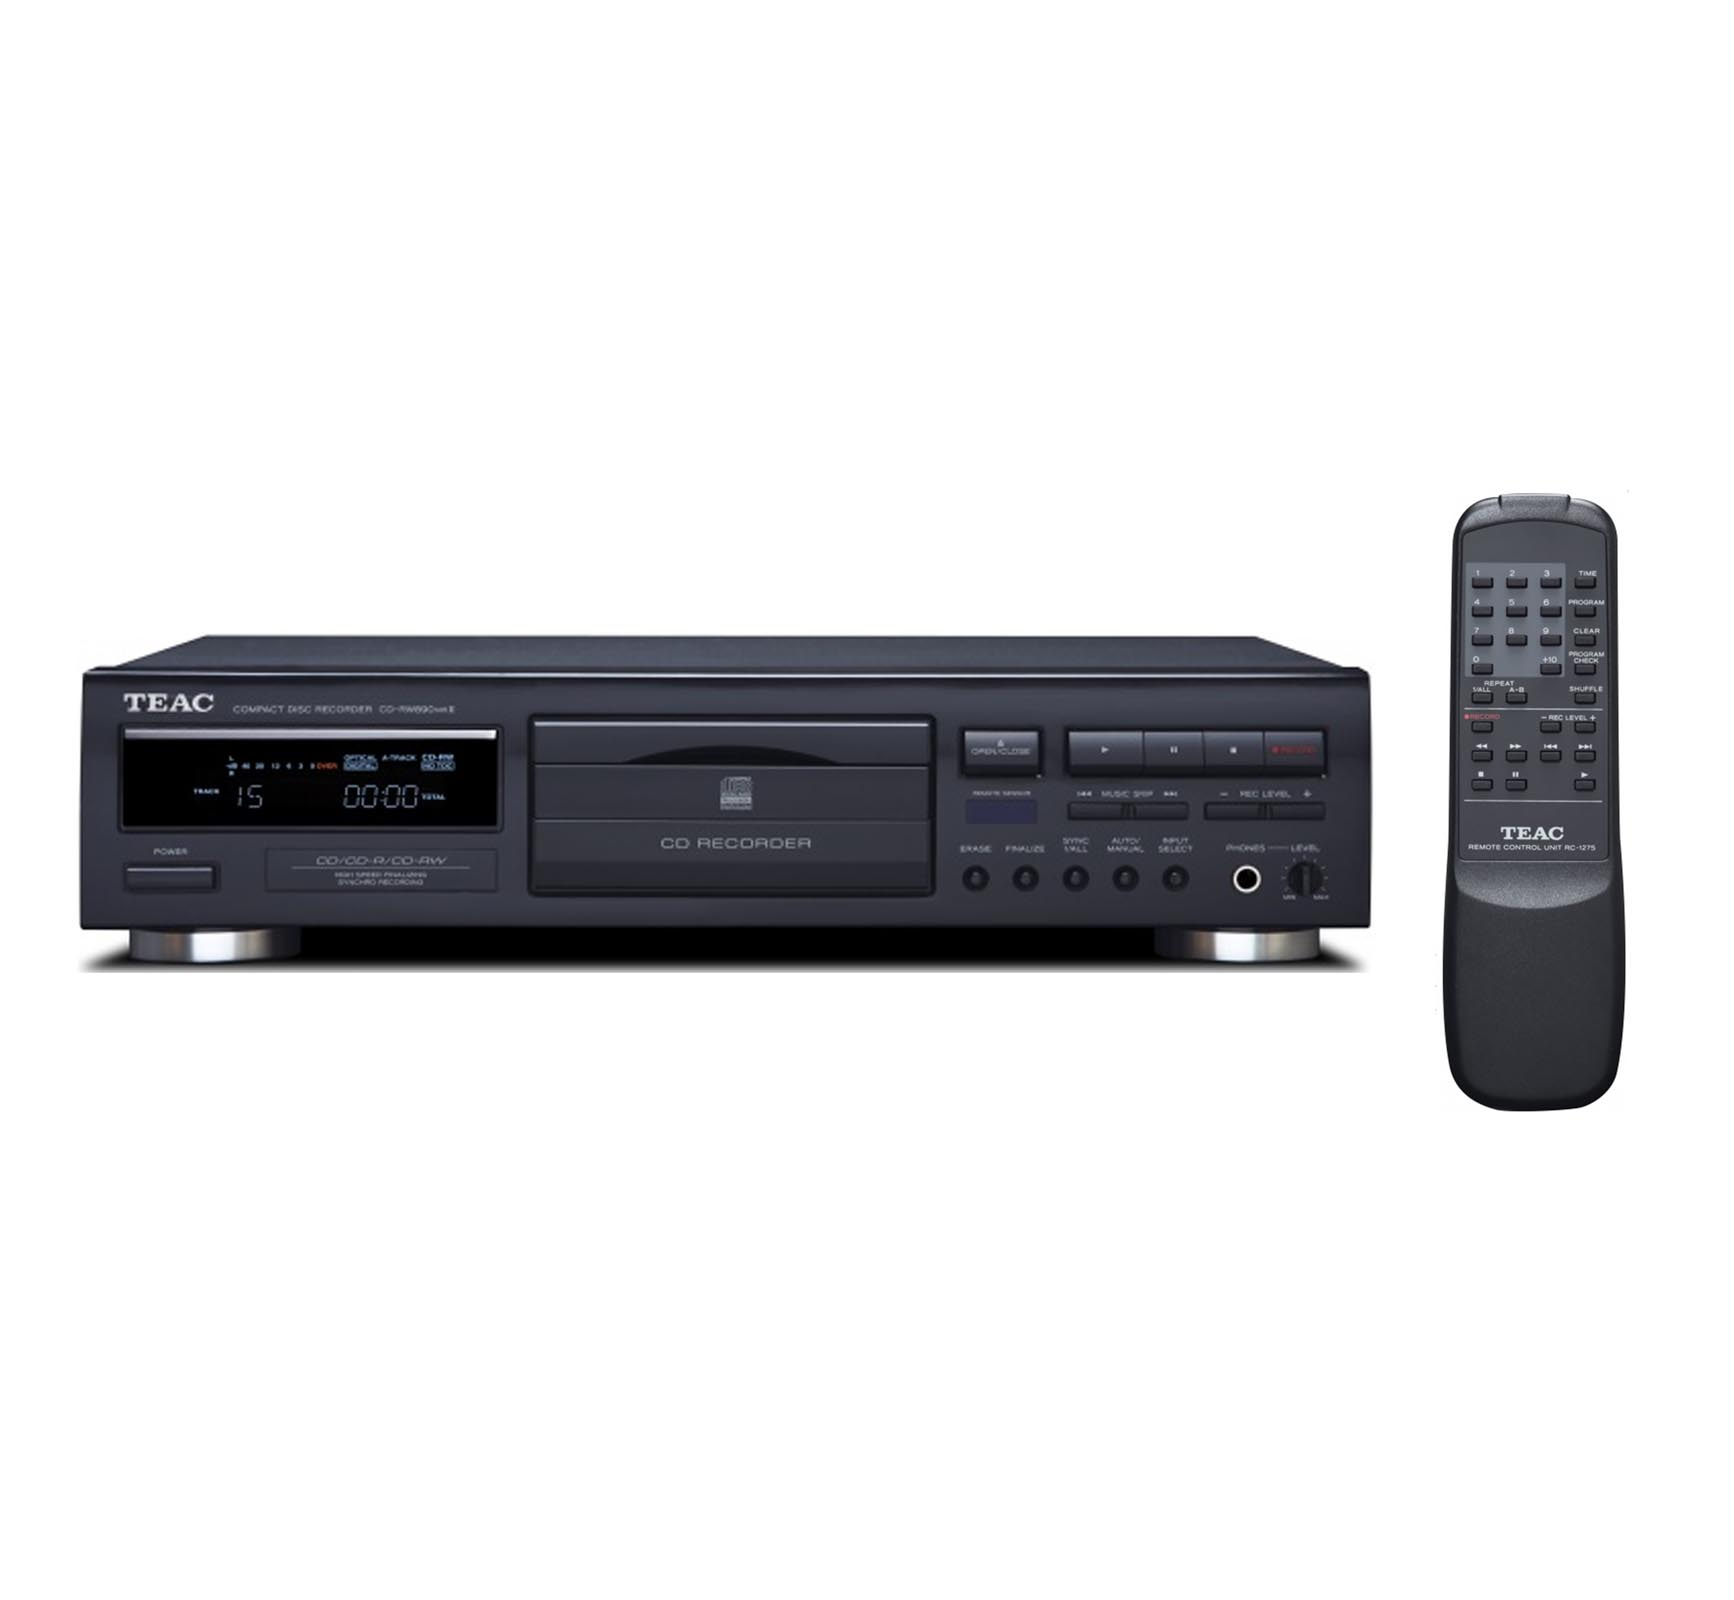 TEAC Digital CD-R RW Audio Recorder & CD Player w Remote & Shuffle CD-RW890mkII by TASCAM